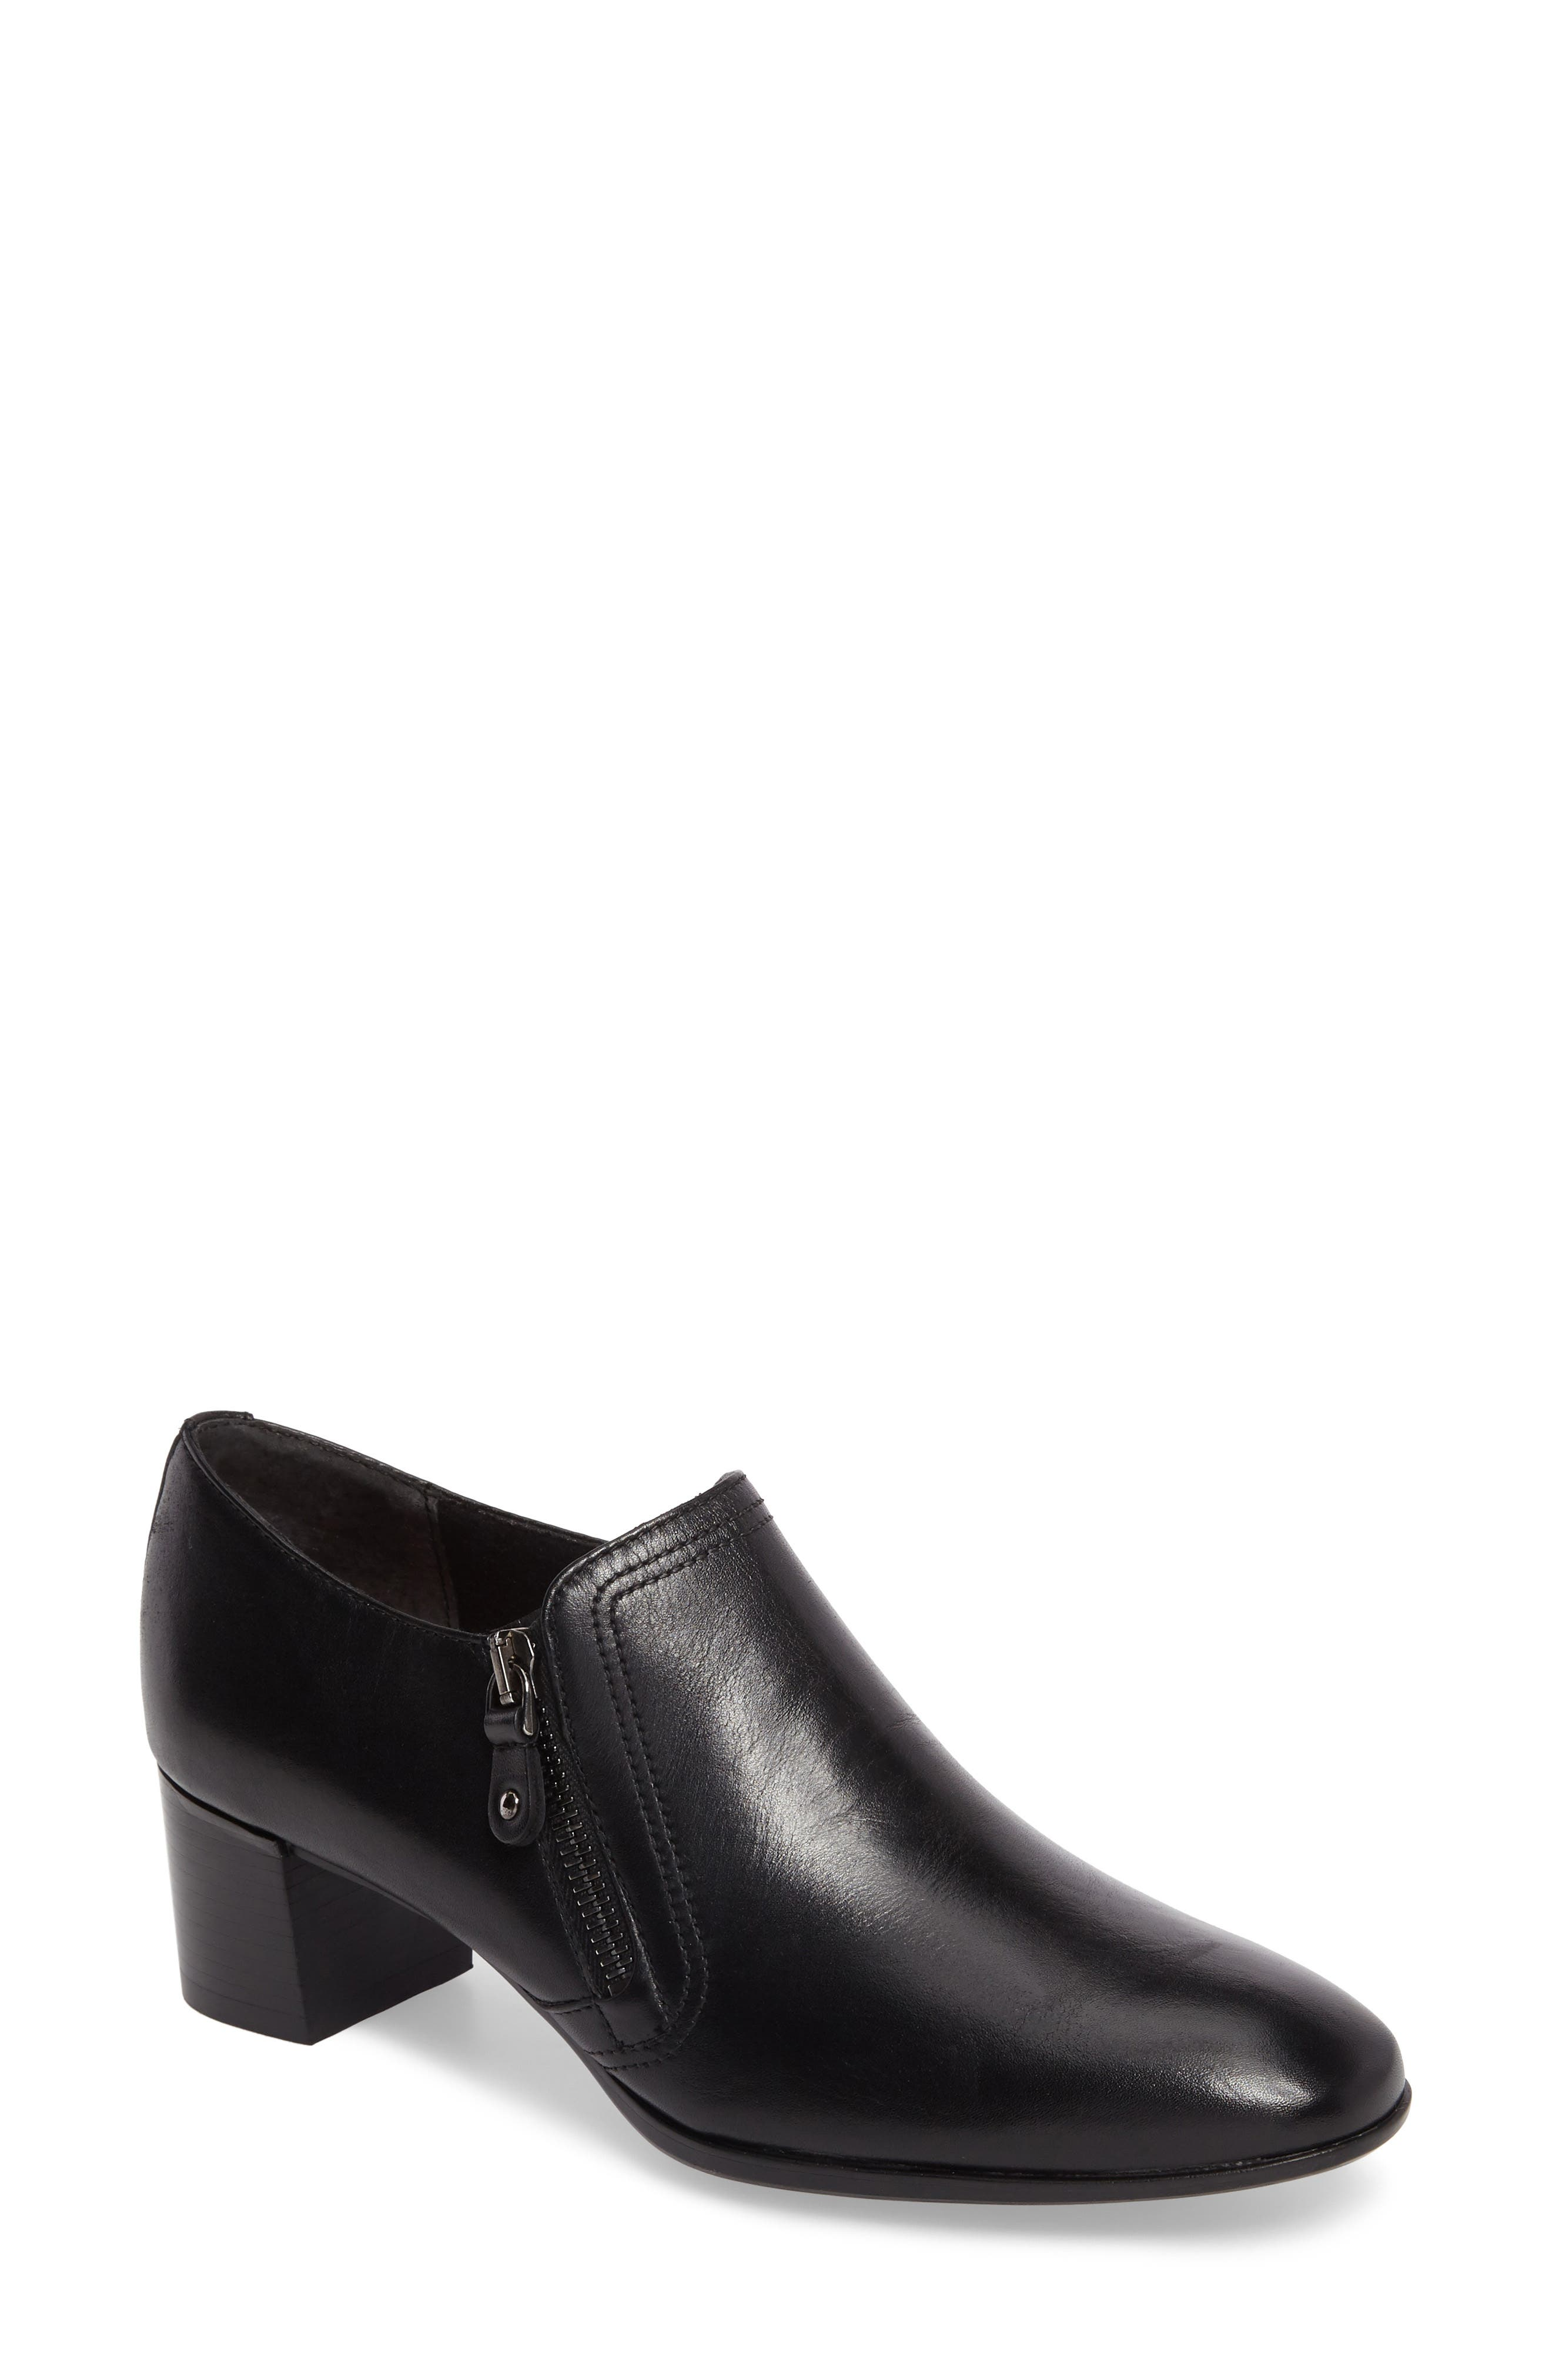 Annee Pump,                         Main,                         color, Black Leather